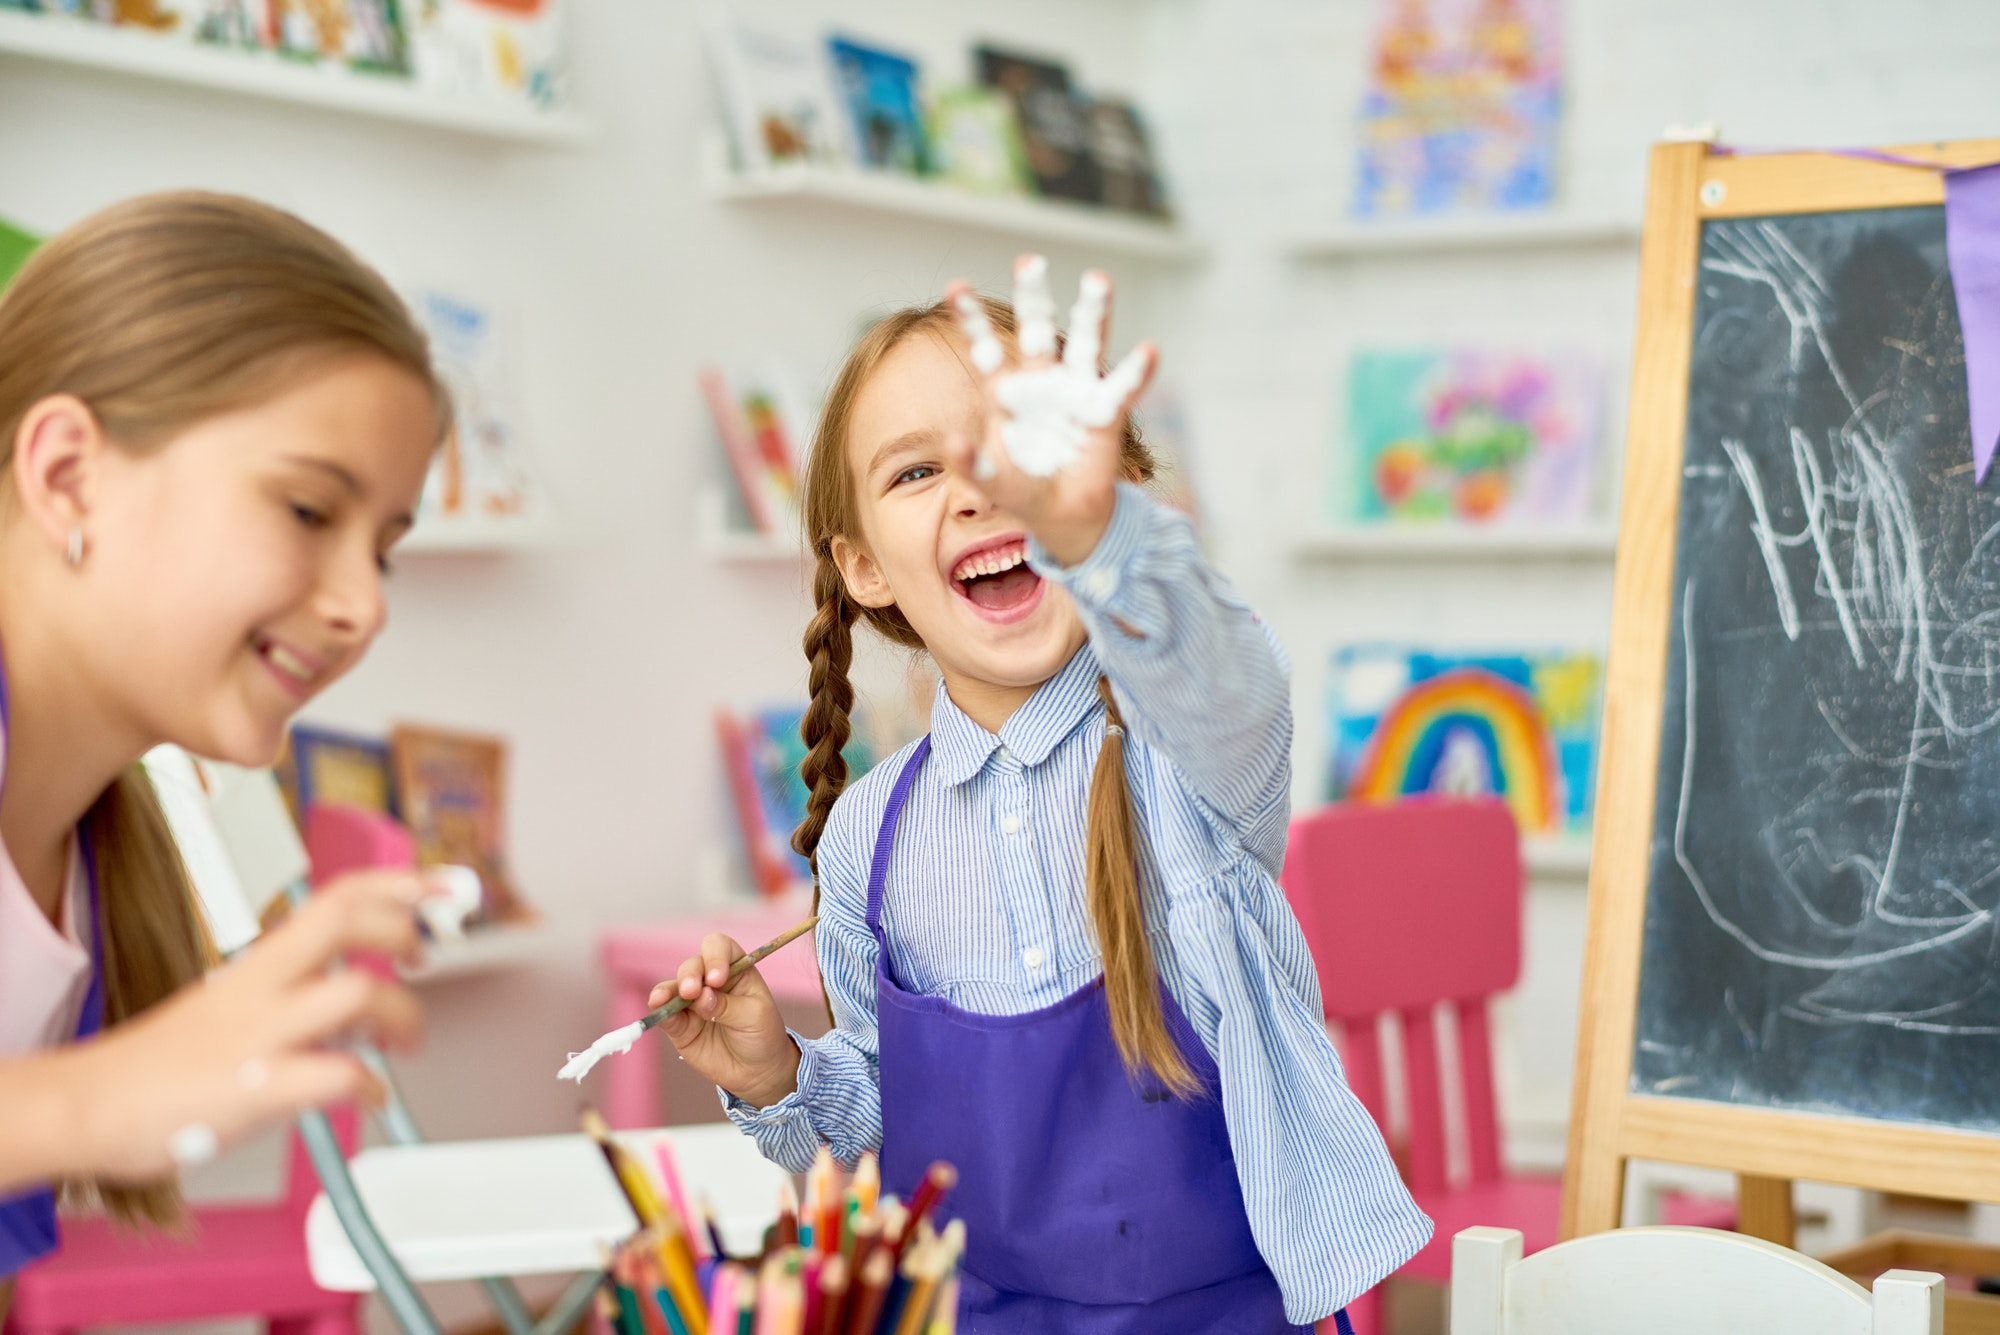 Children Having Fun with Paint